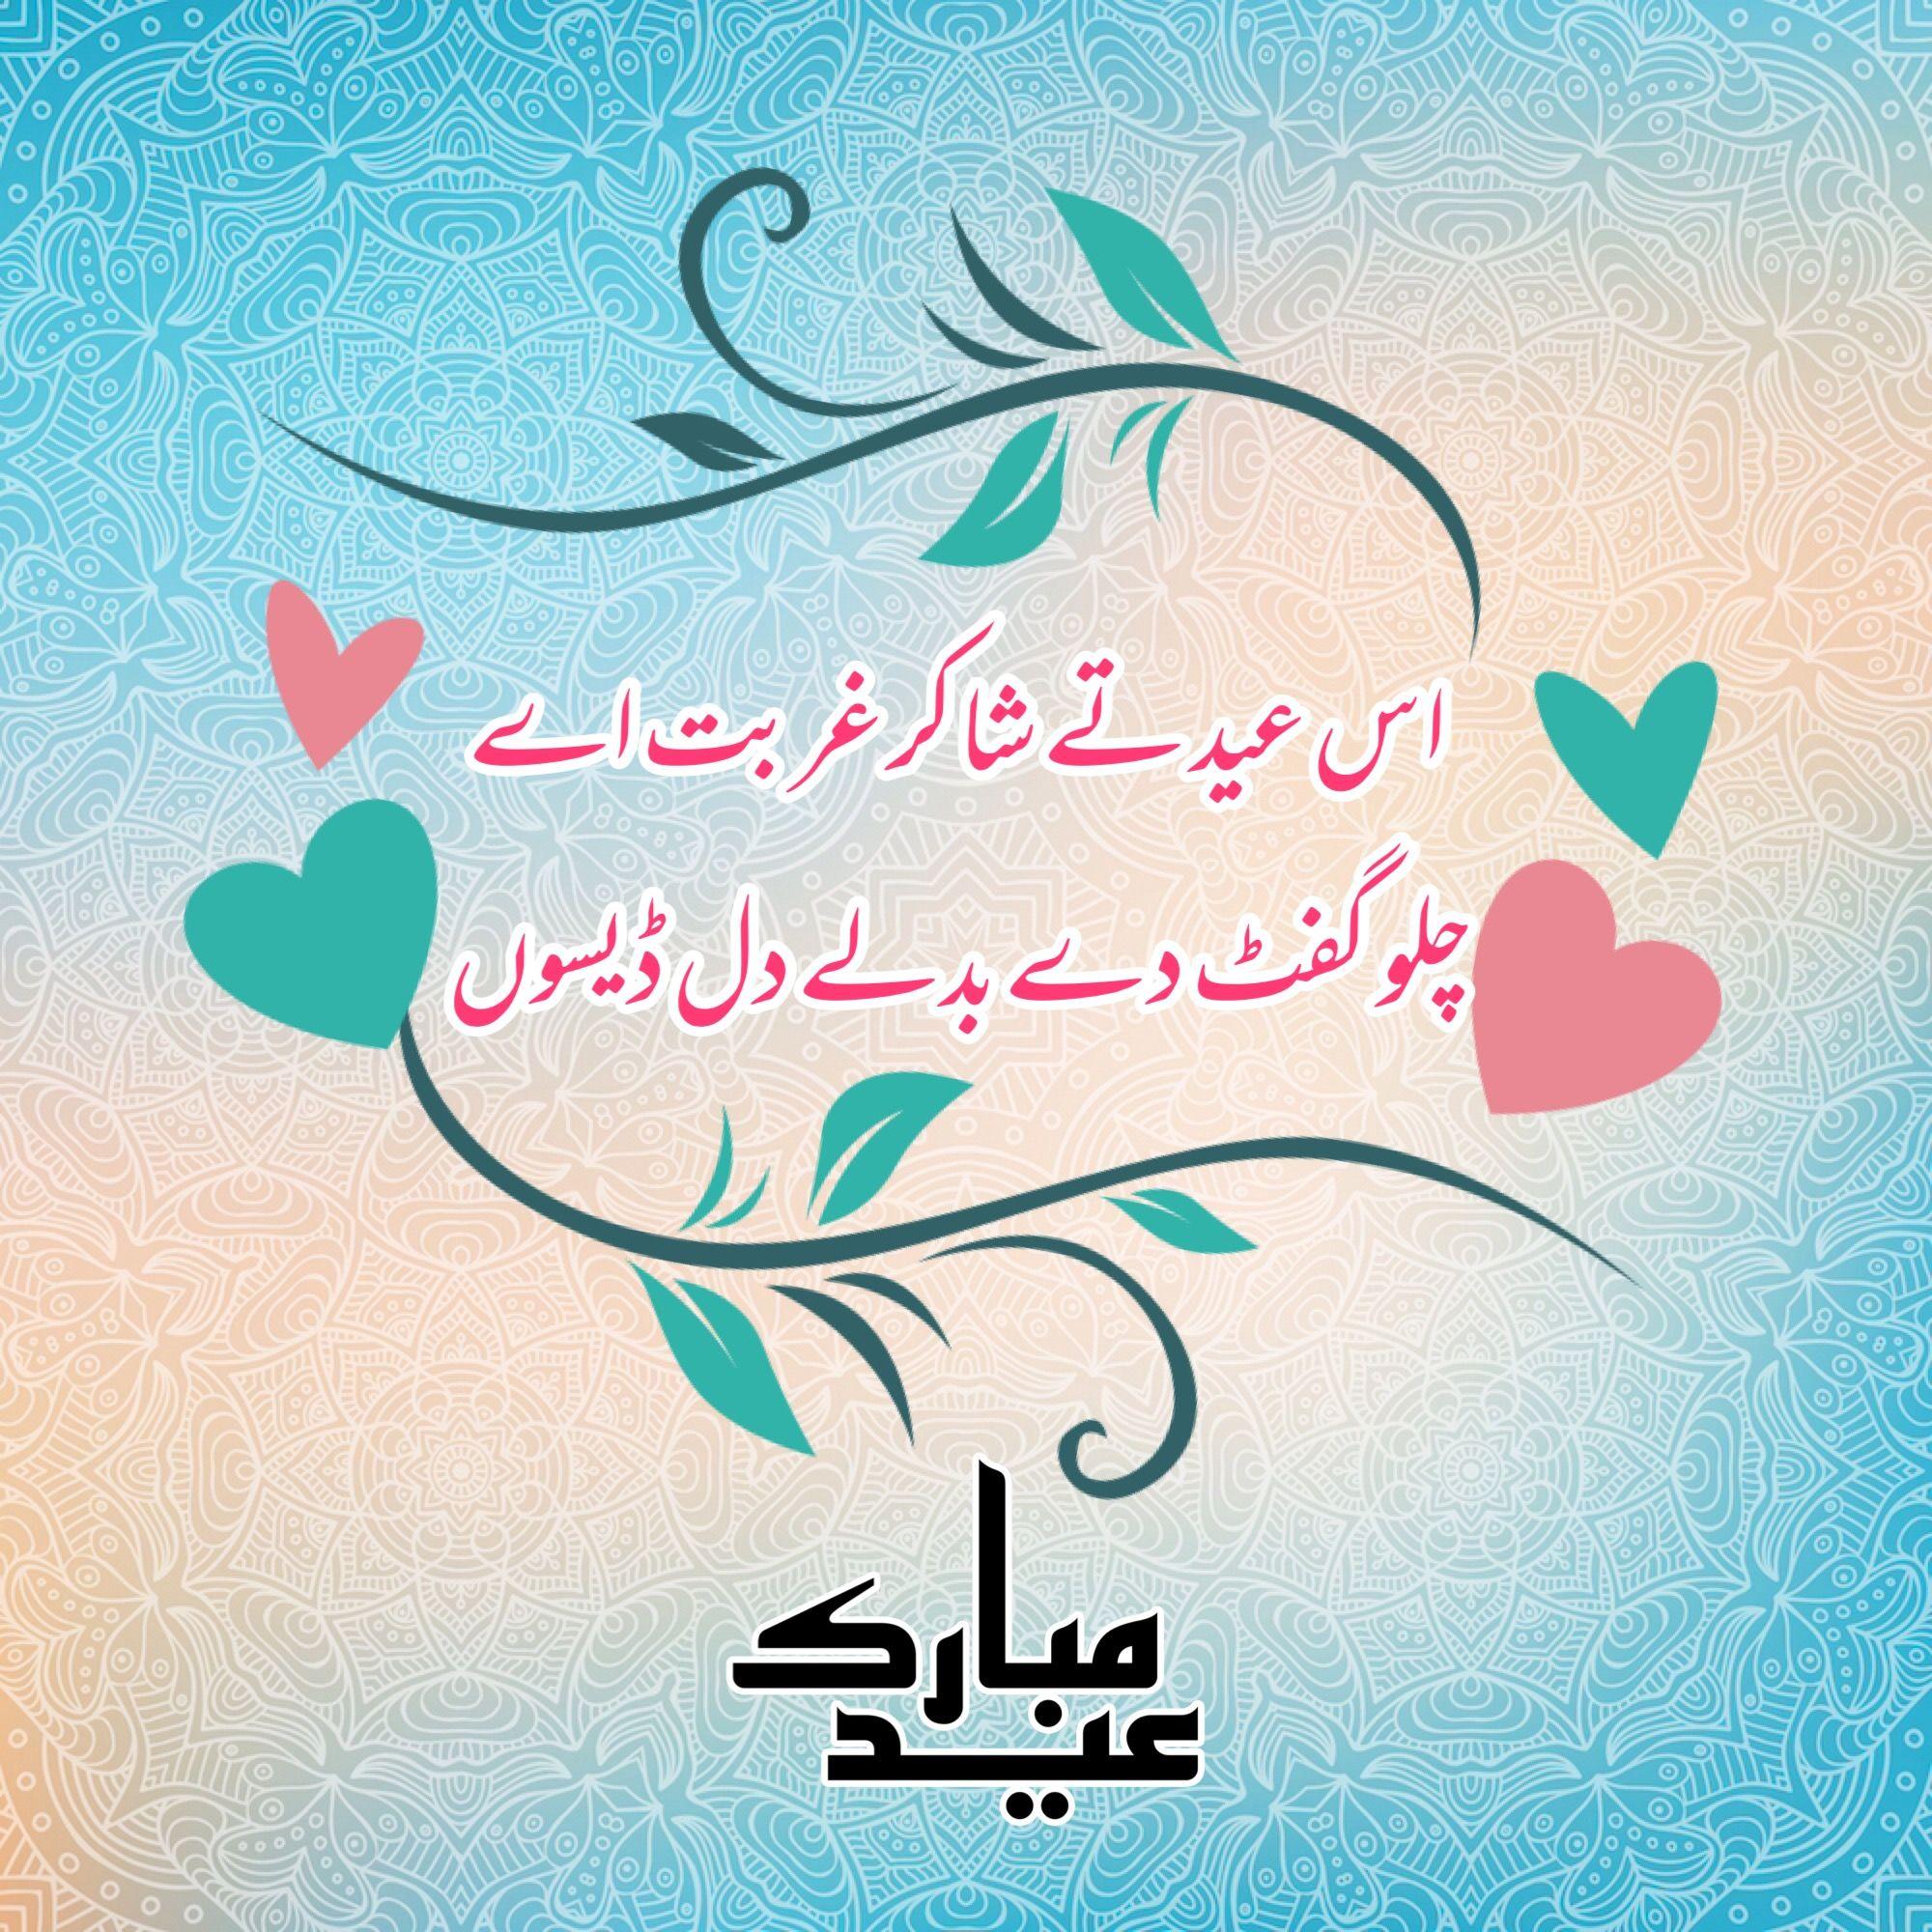 Eid greetings eid mubarak urdu poetry punjabi pakistan eid greetings eid mubarak urdu poetry punjabi pakistan m4hsunfo